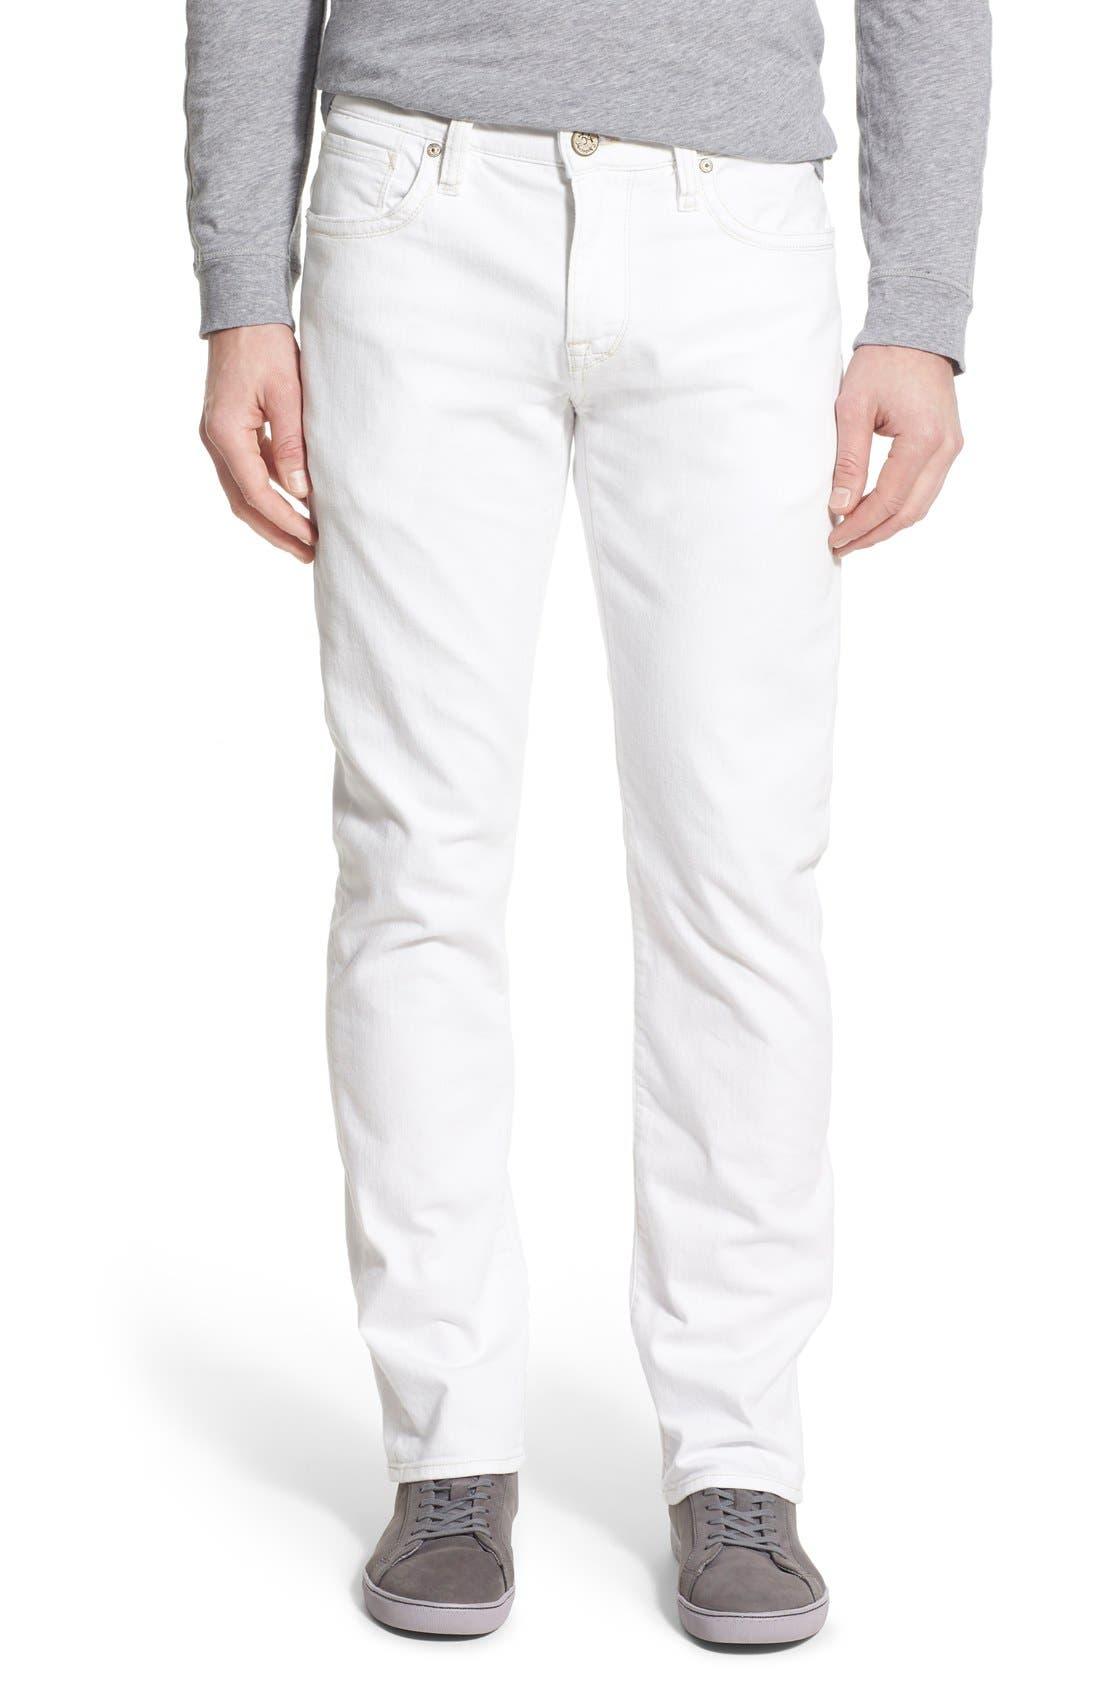 'Courage' Straight Leg Jeans,                         Main,                         color, White Denim